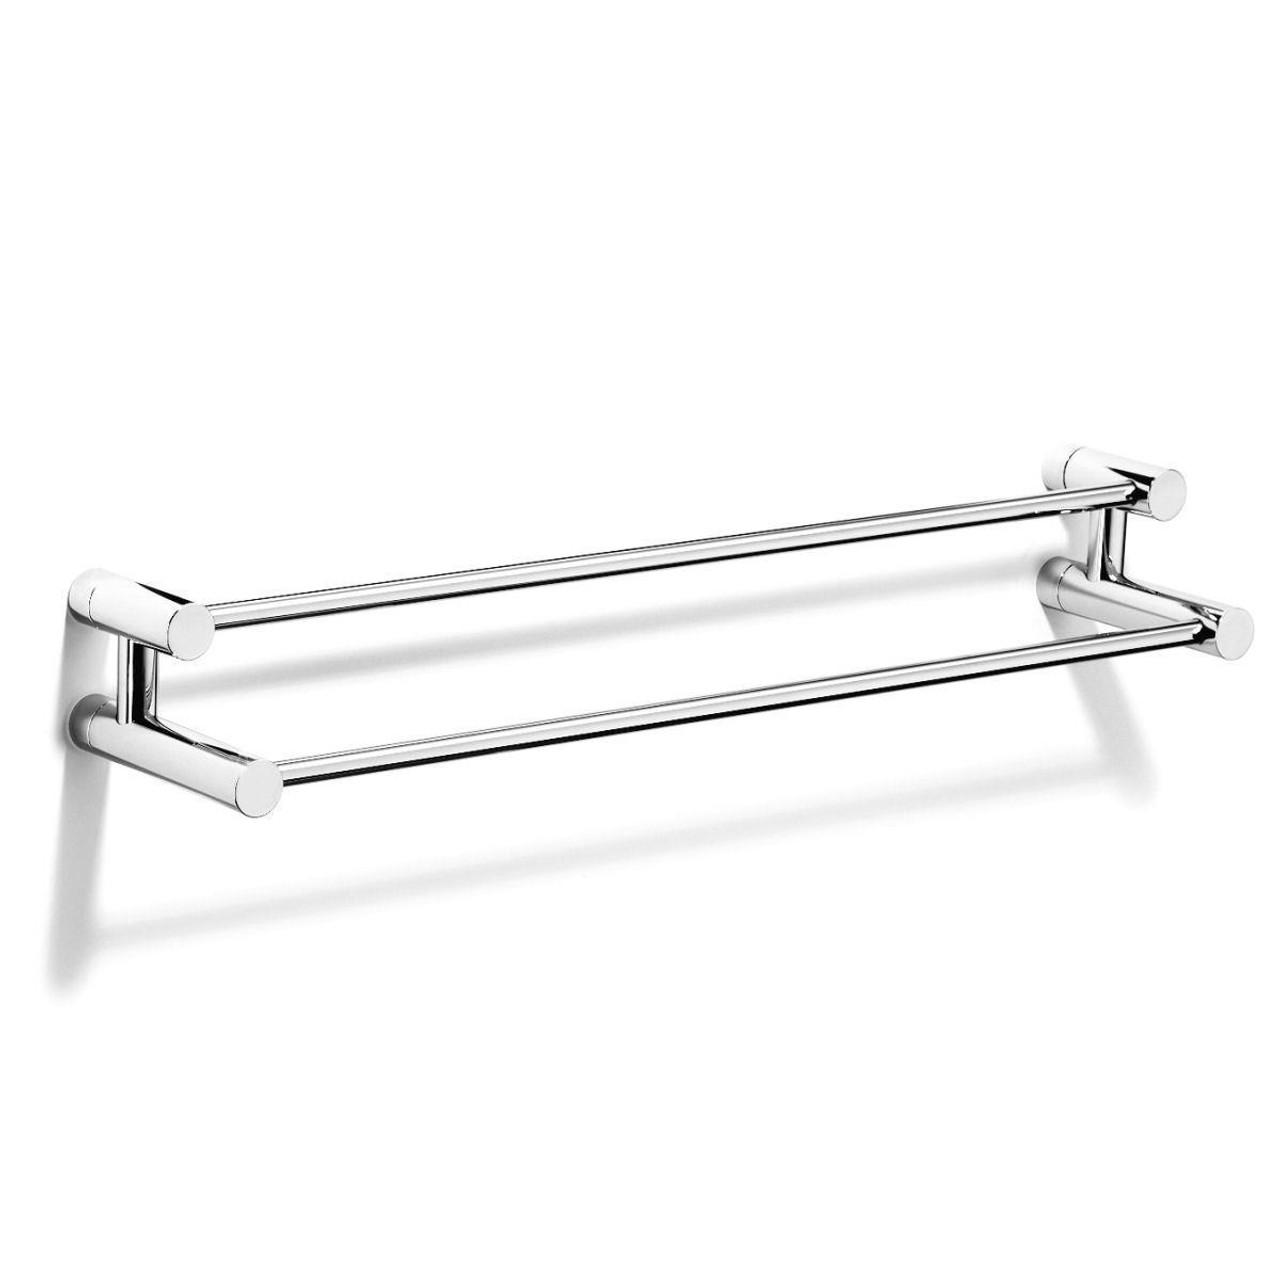 Chrome Plated Samuel Heath Xenon Double Towel Rail N5301